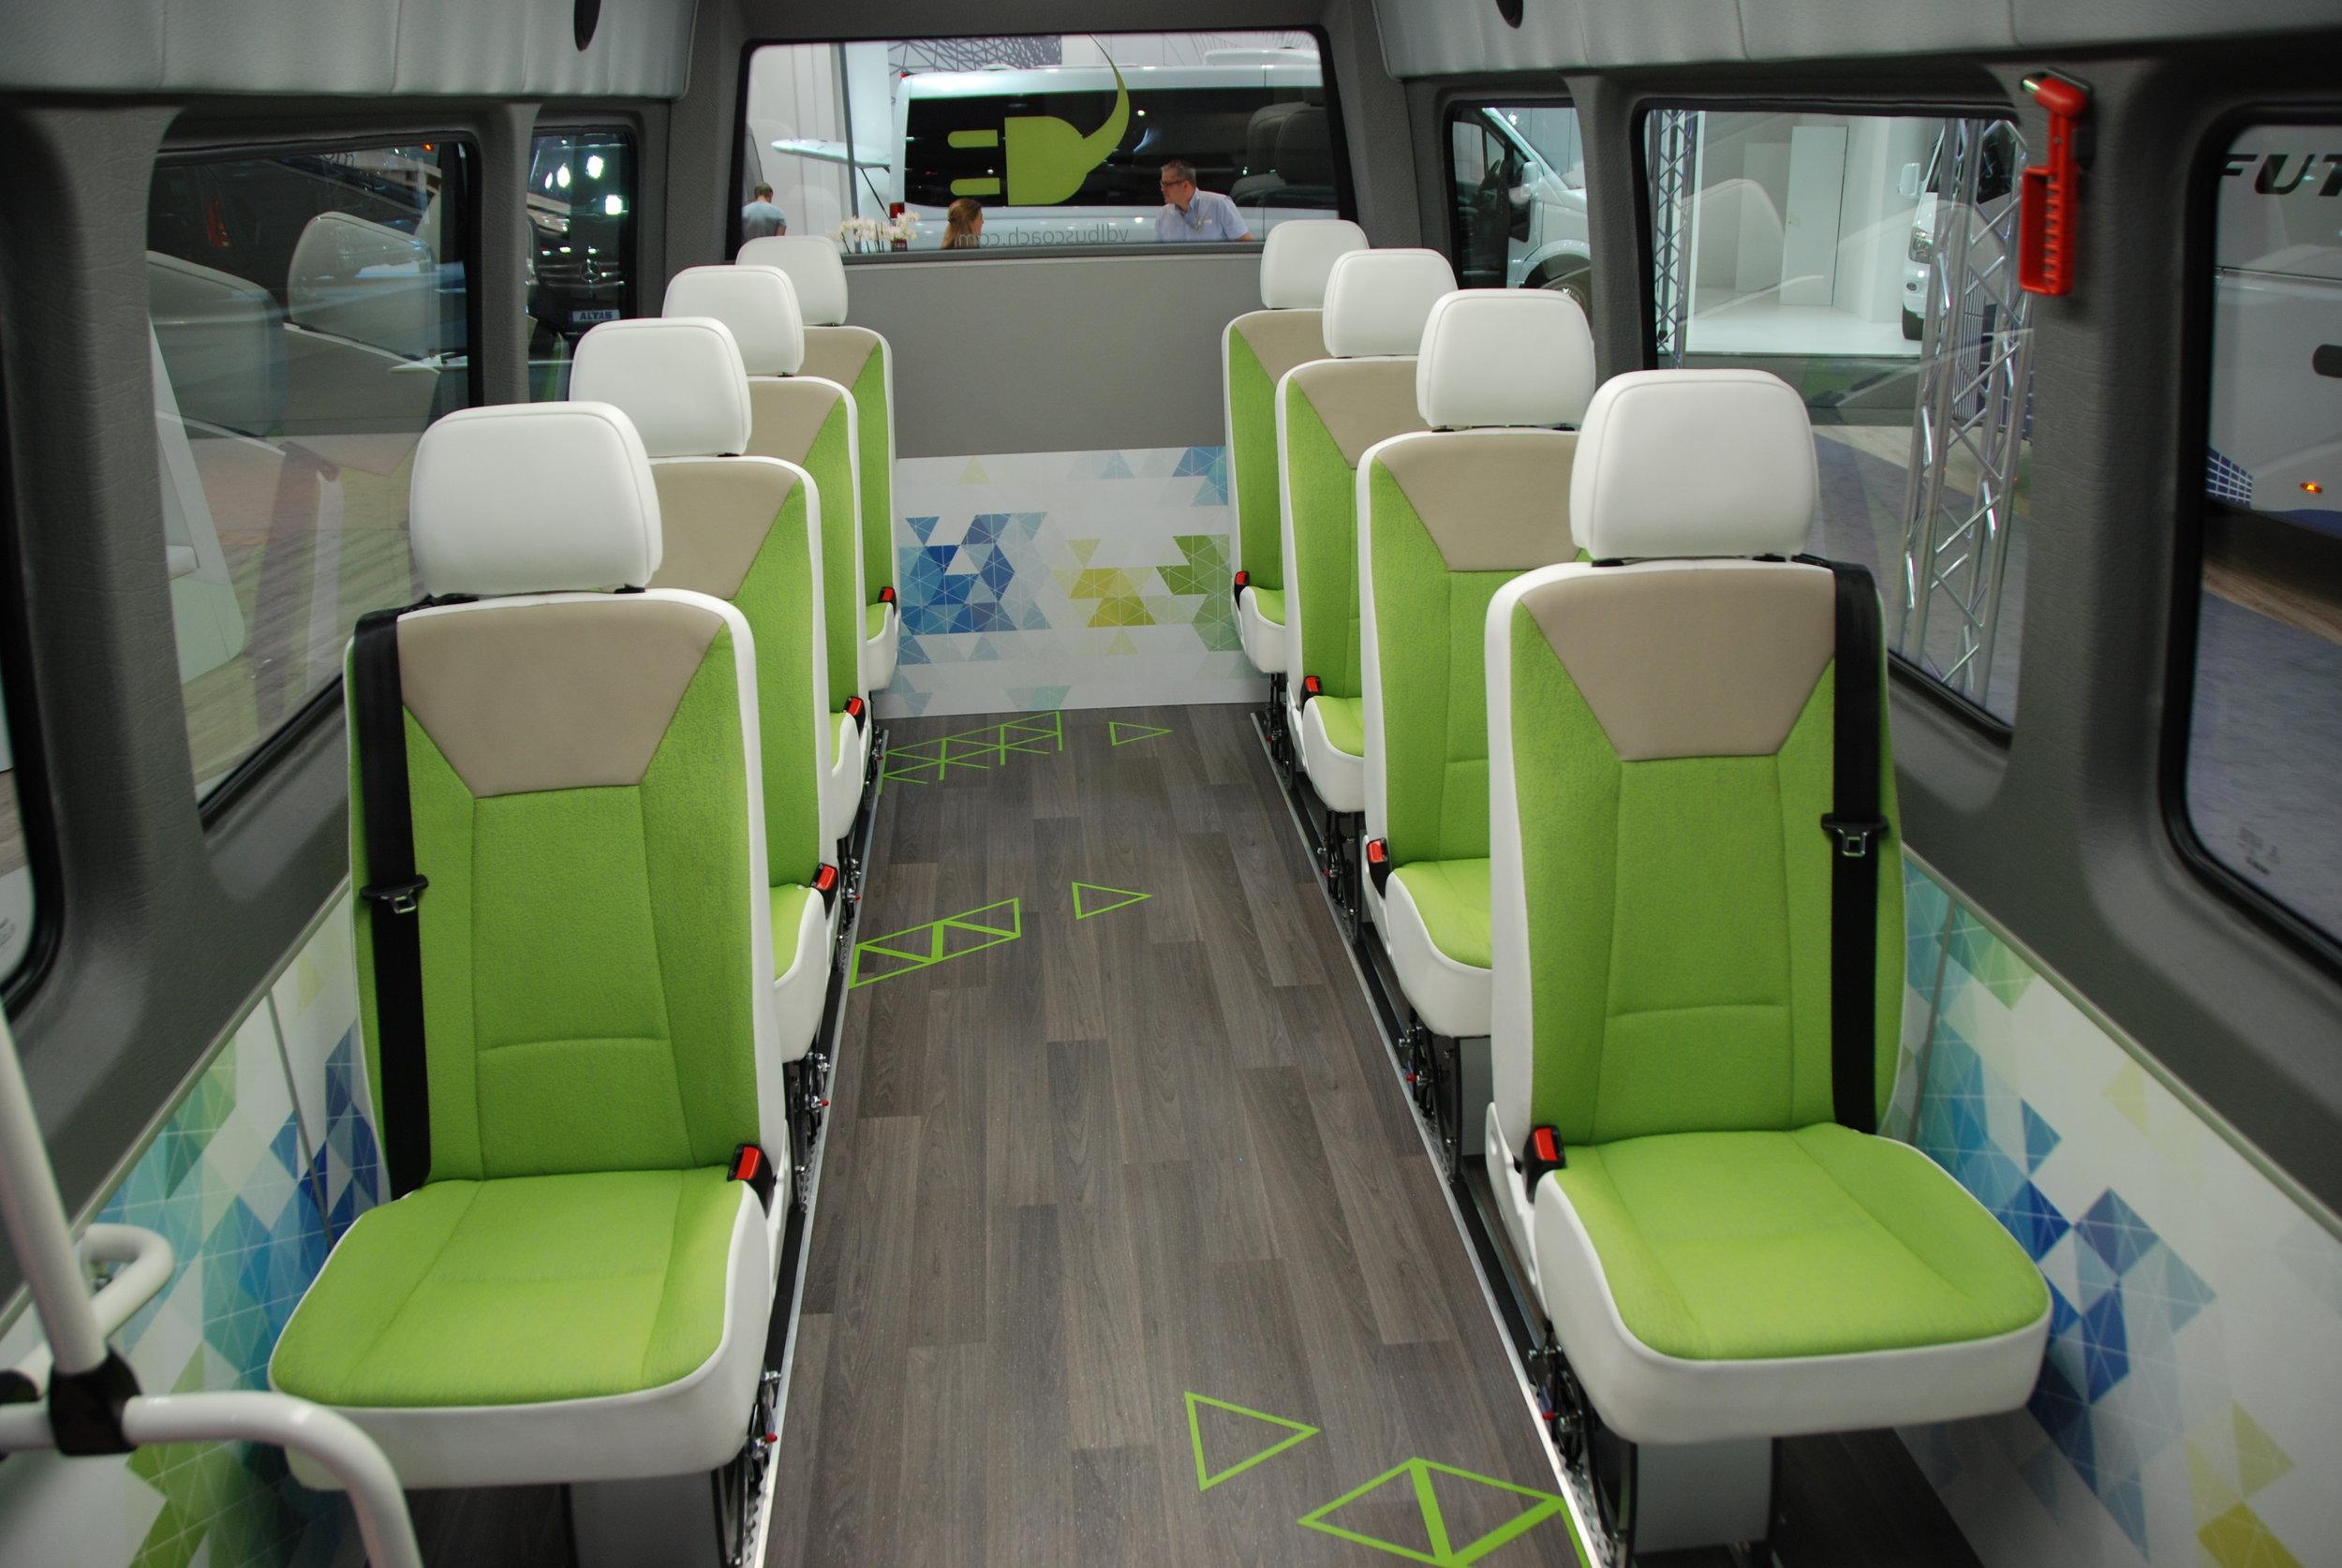 Zajímavě řešený interiér elektrobusu VDL MidBasic Electric. (foto: Libor Hinčica)